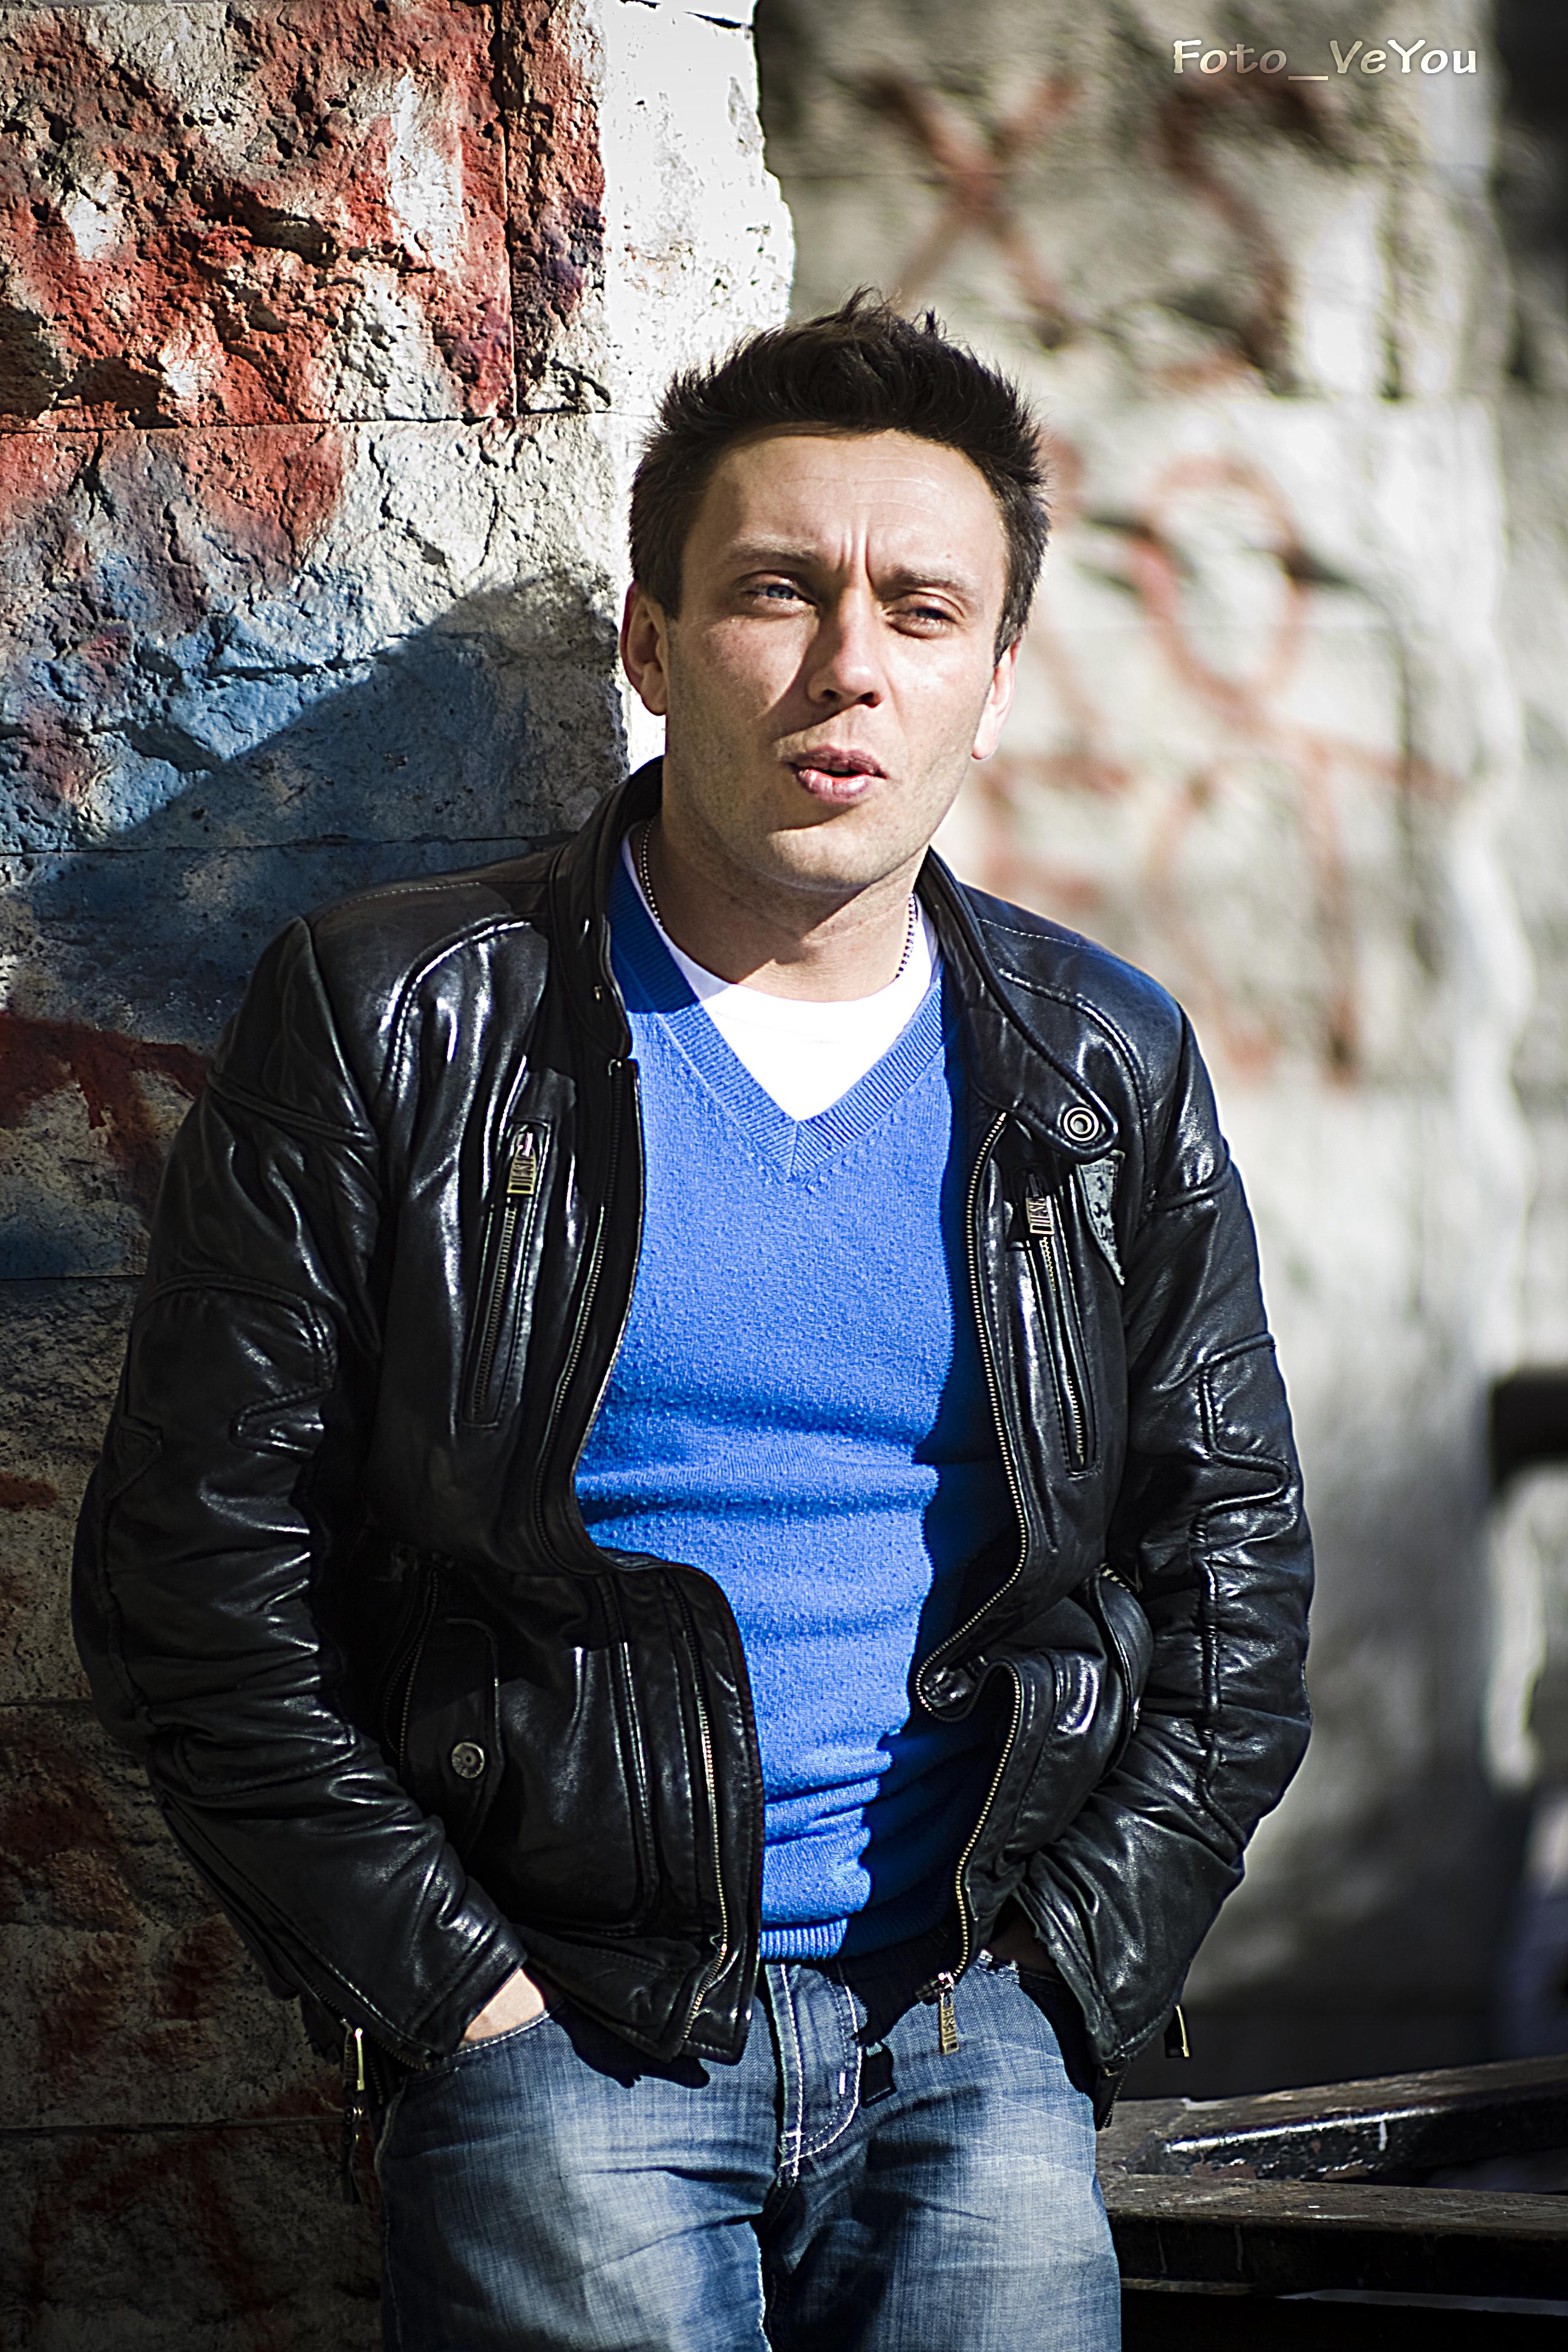 Захарьин Антон photo